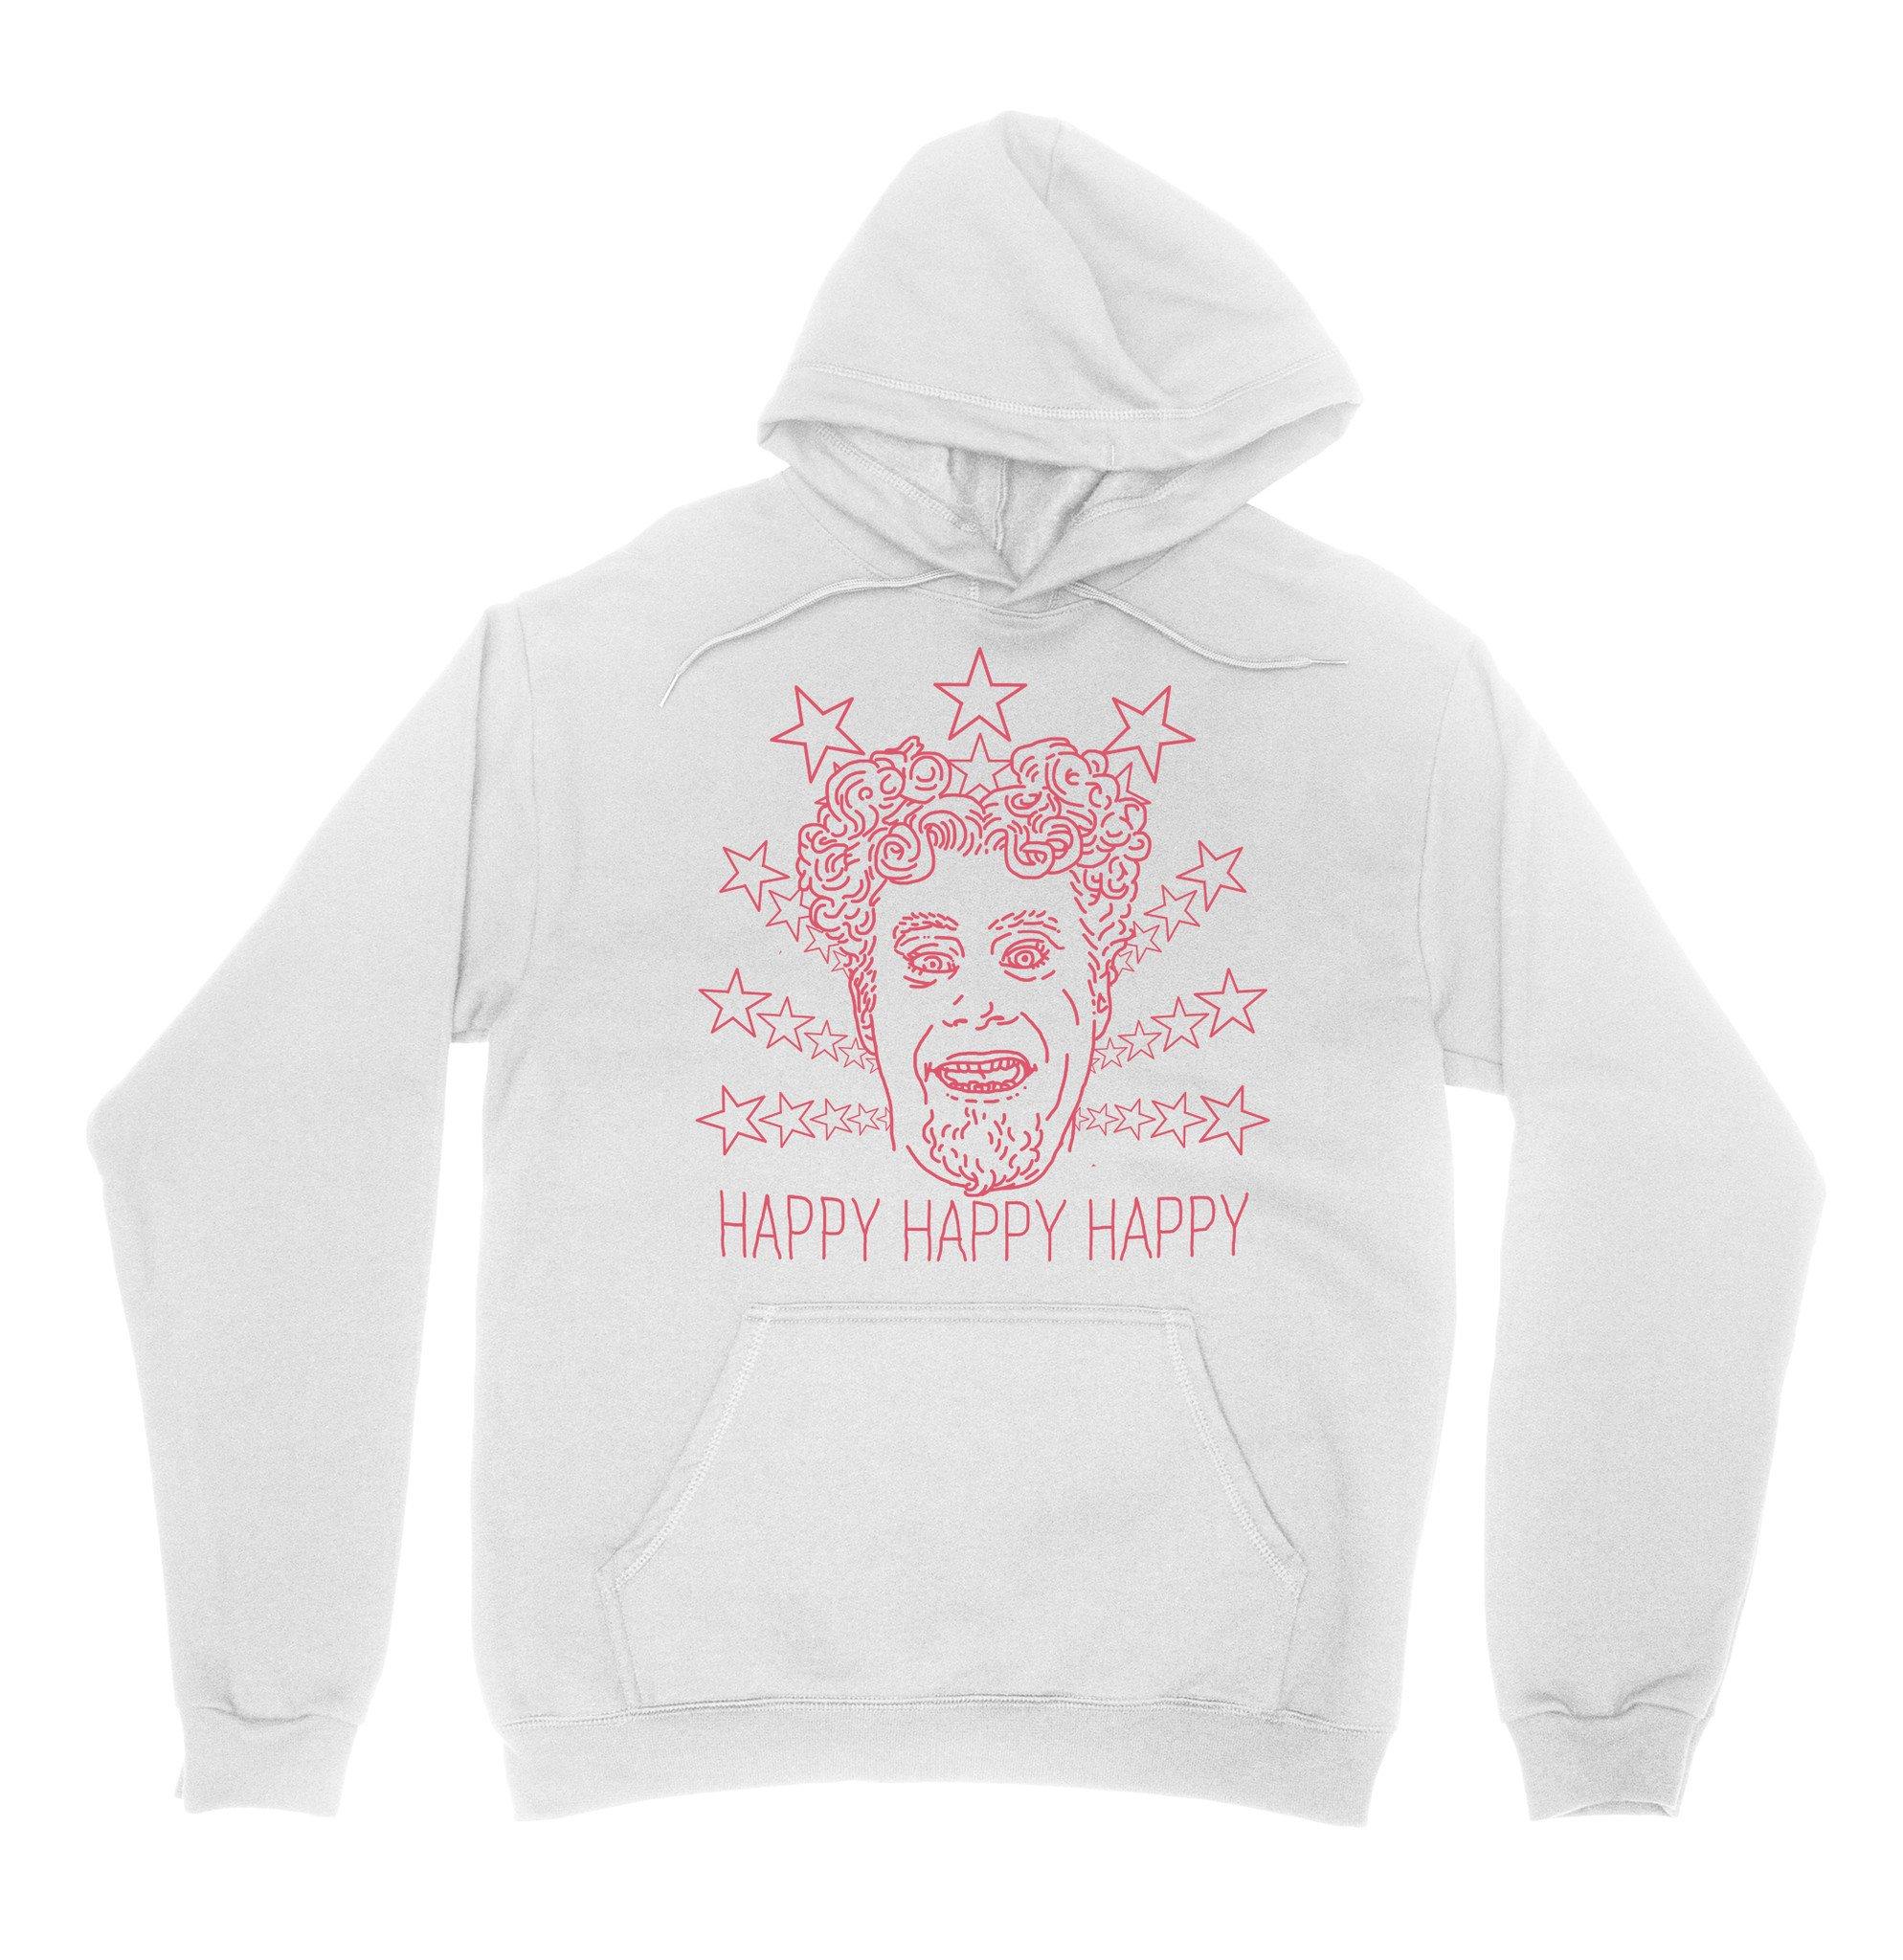 Mugato, Happy, Happy, Happy 'Zoolander' Hoodie